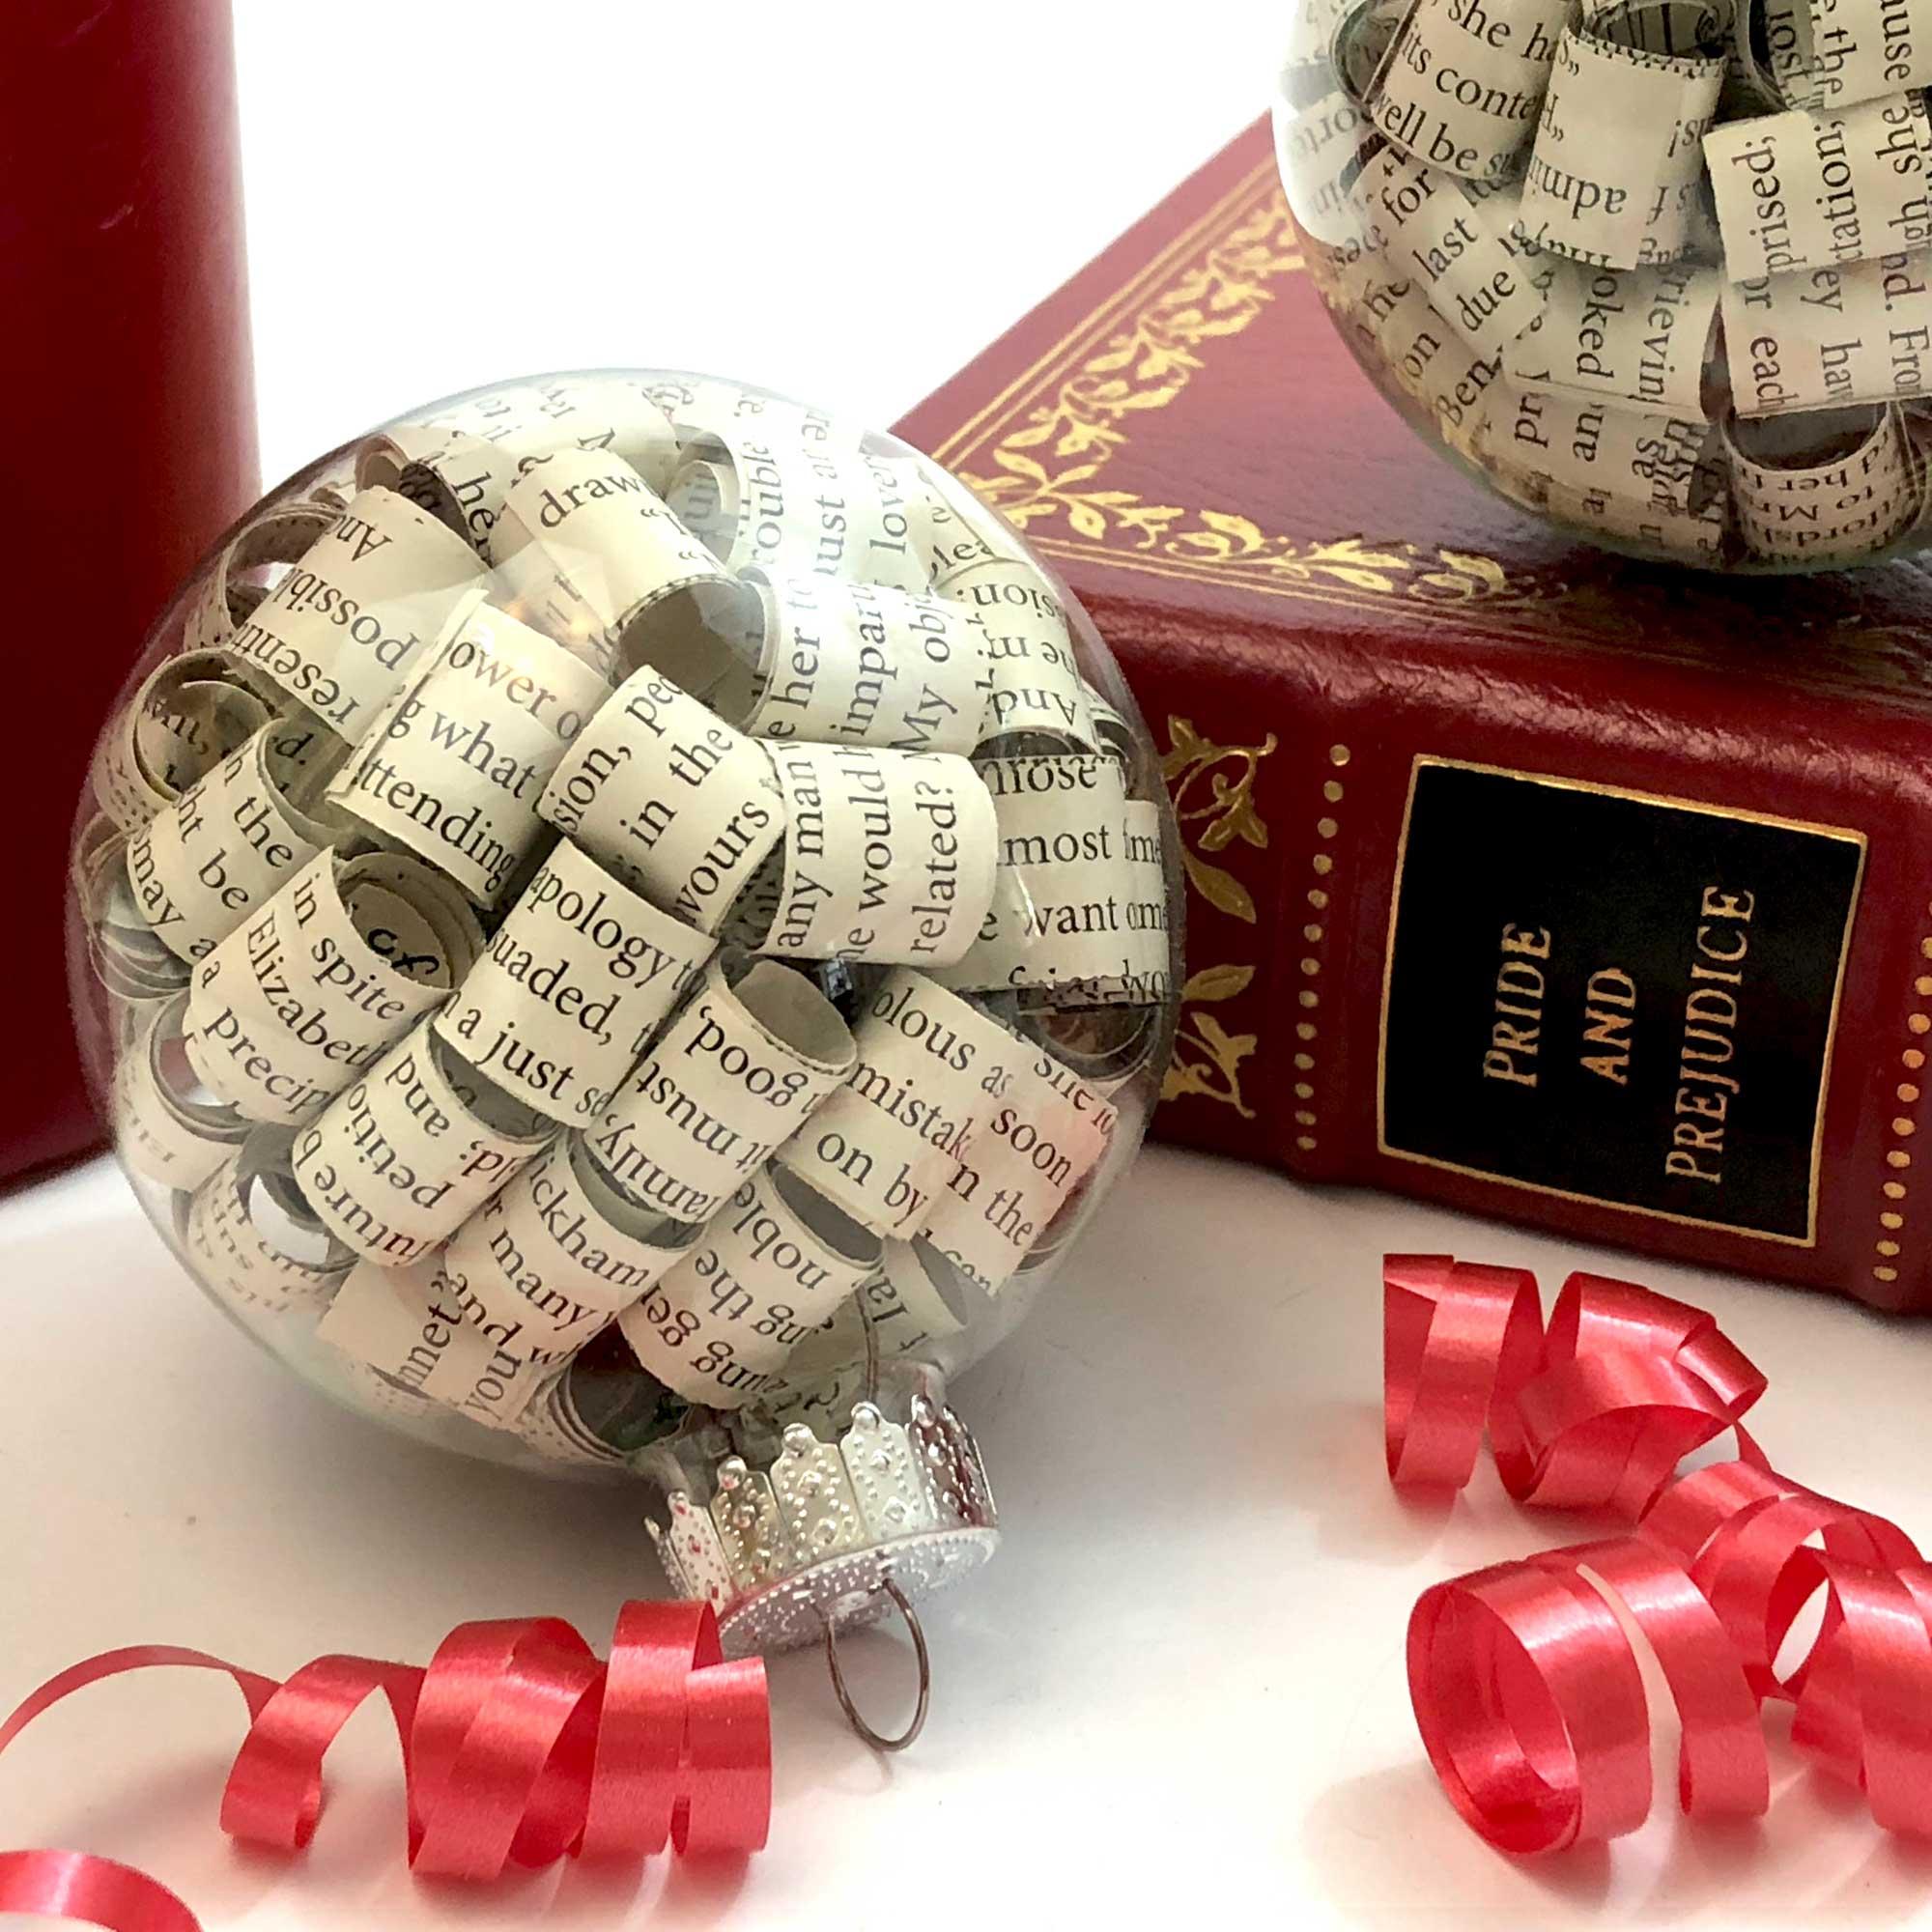 jane-austen-christmas-decorations